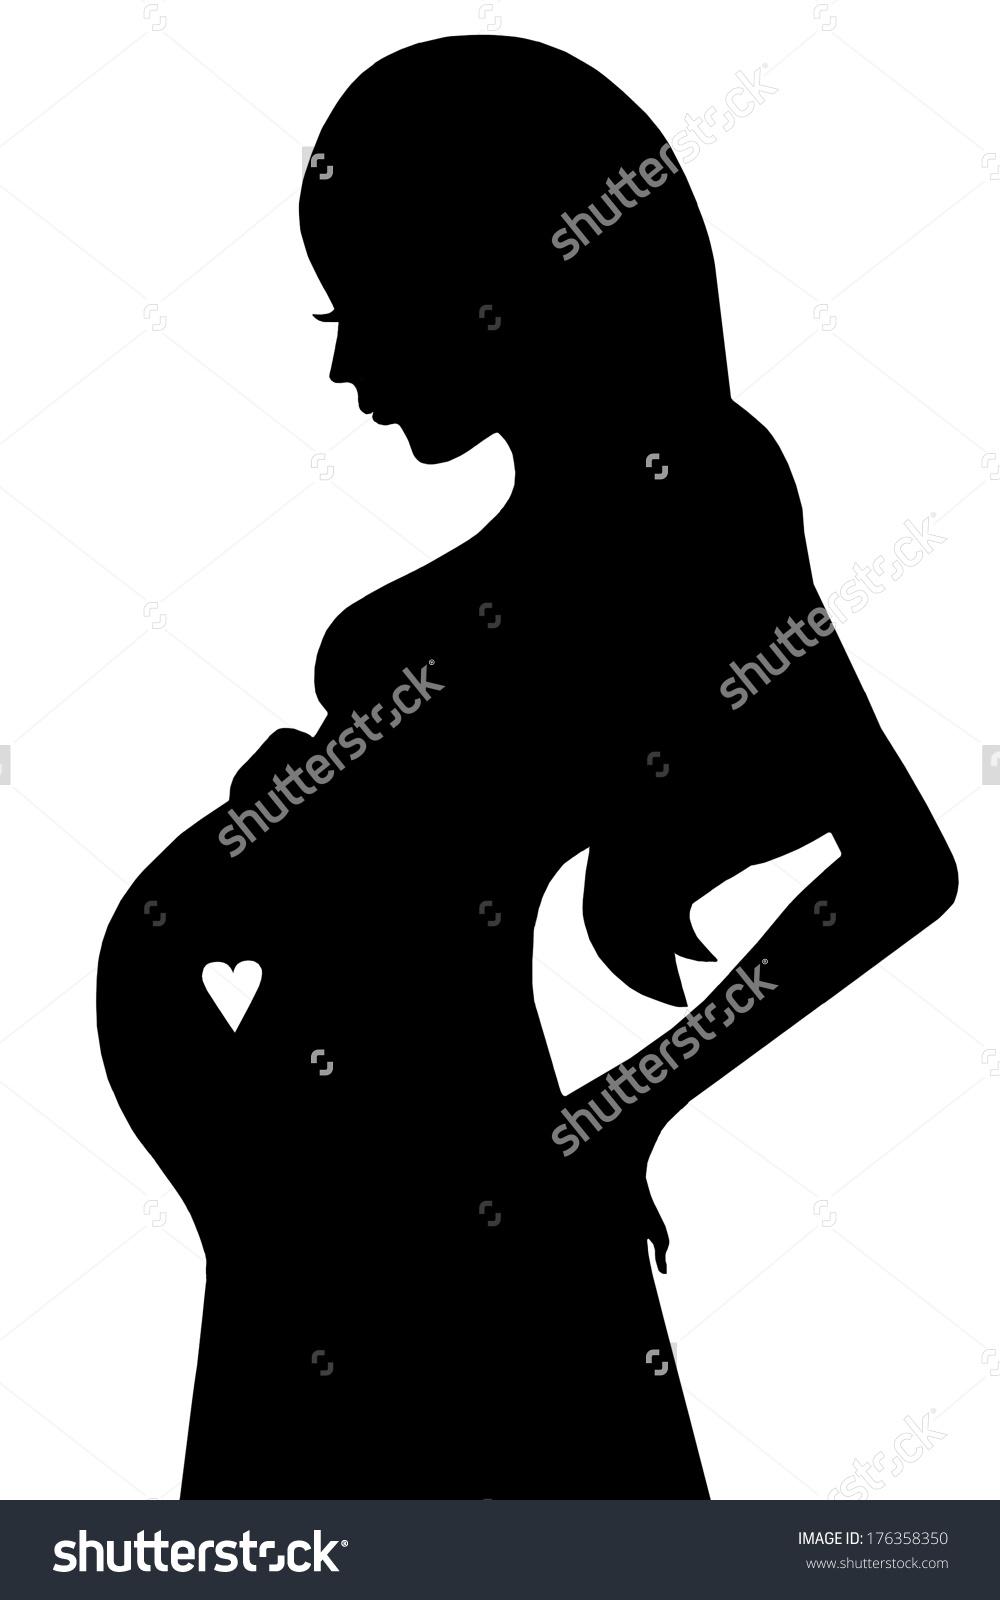 Clip Art Illustration Silhouette Pregnant Woman Stock Illustration.